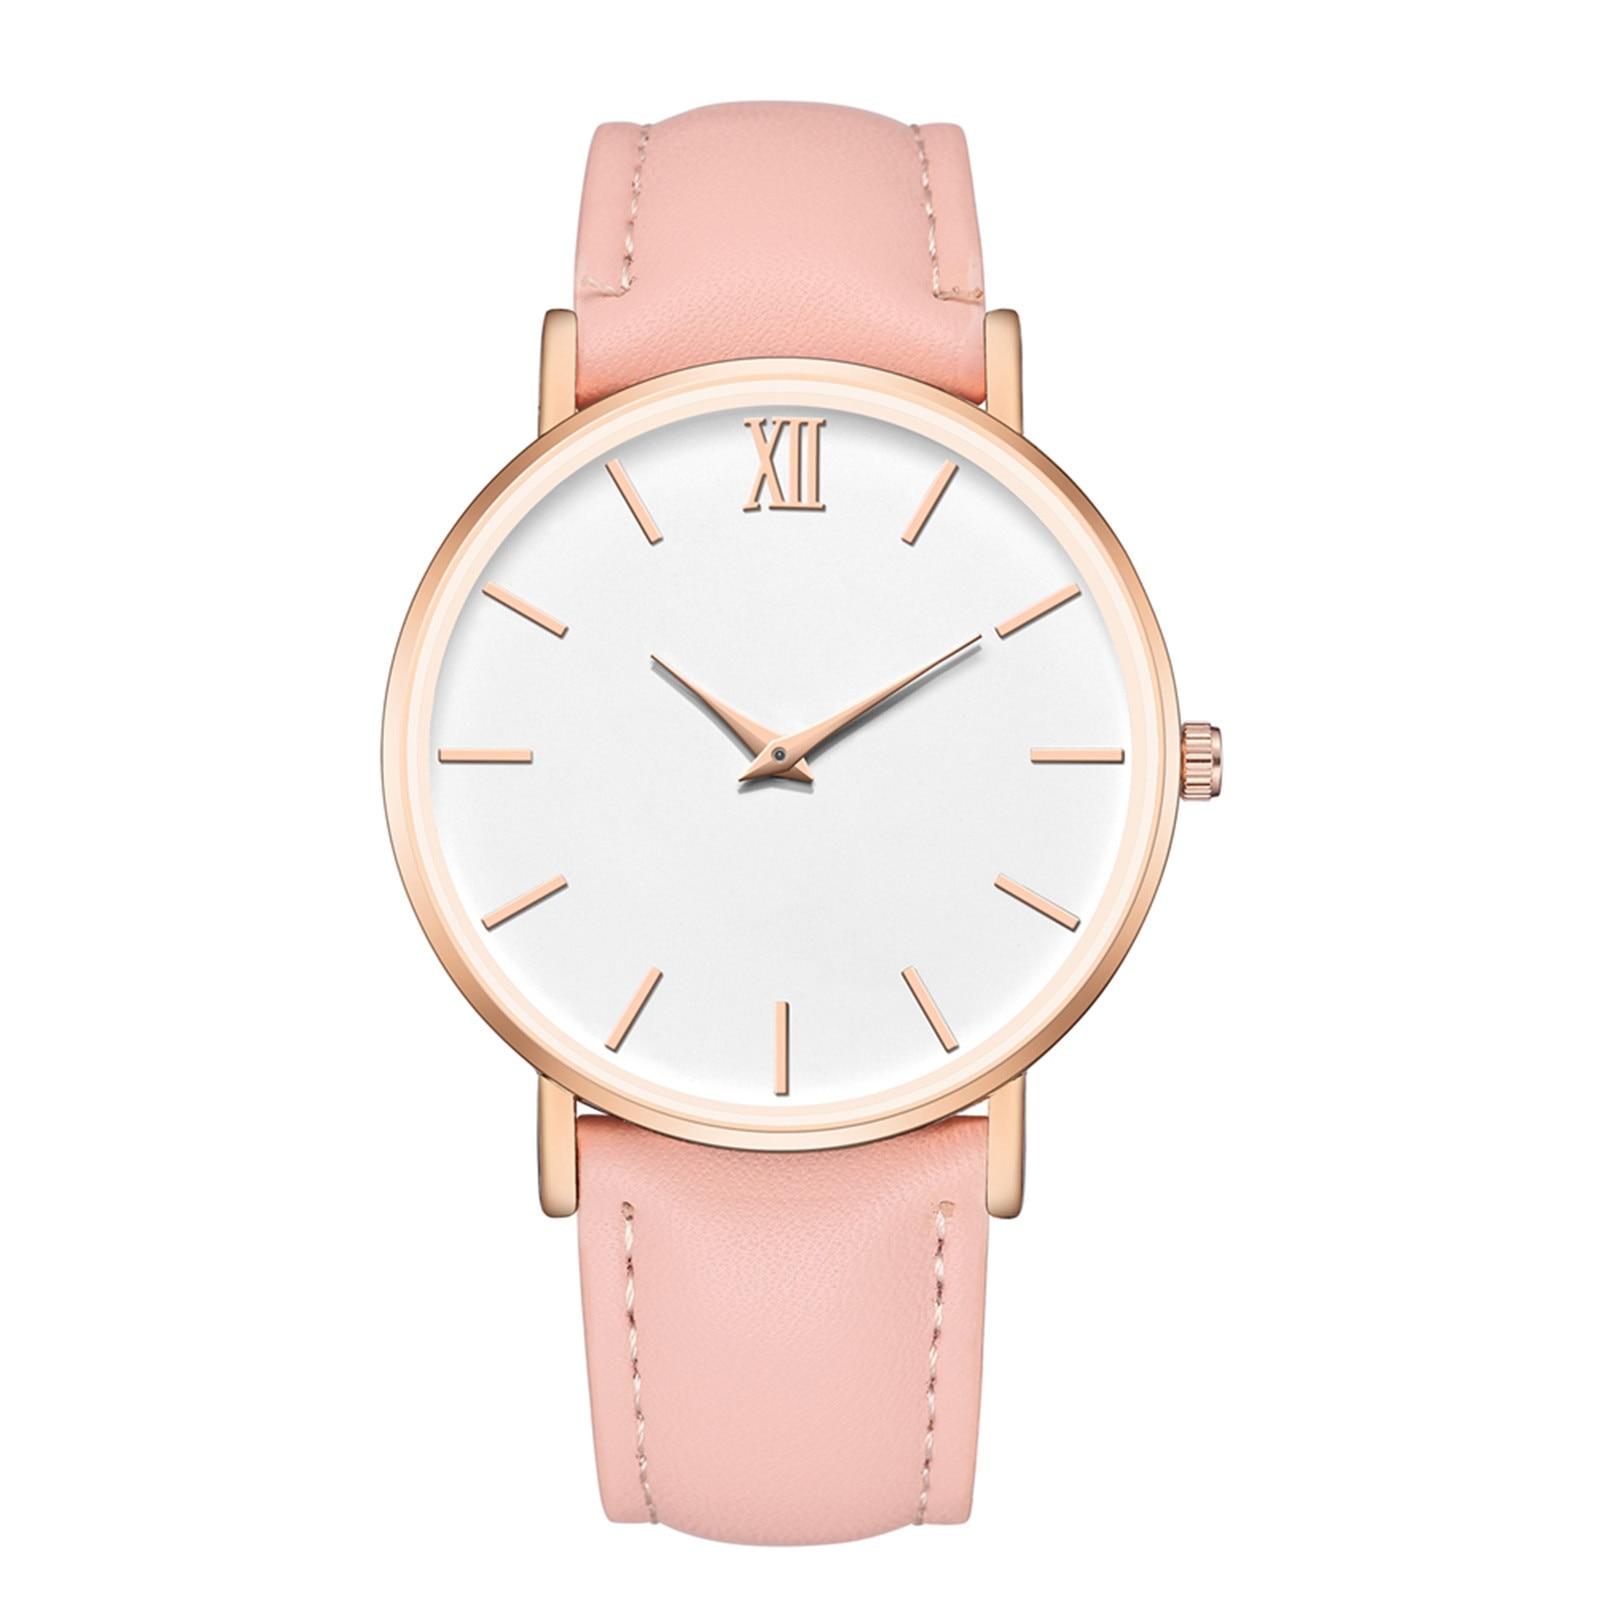 Luxury Wrist Watches Fashionable Casual Women Quartz Watch Small Strap Circular Dial Women Wathes La